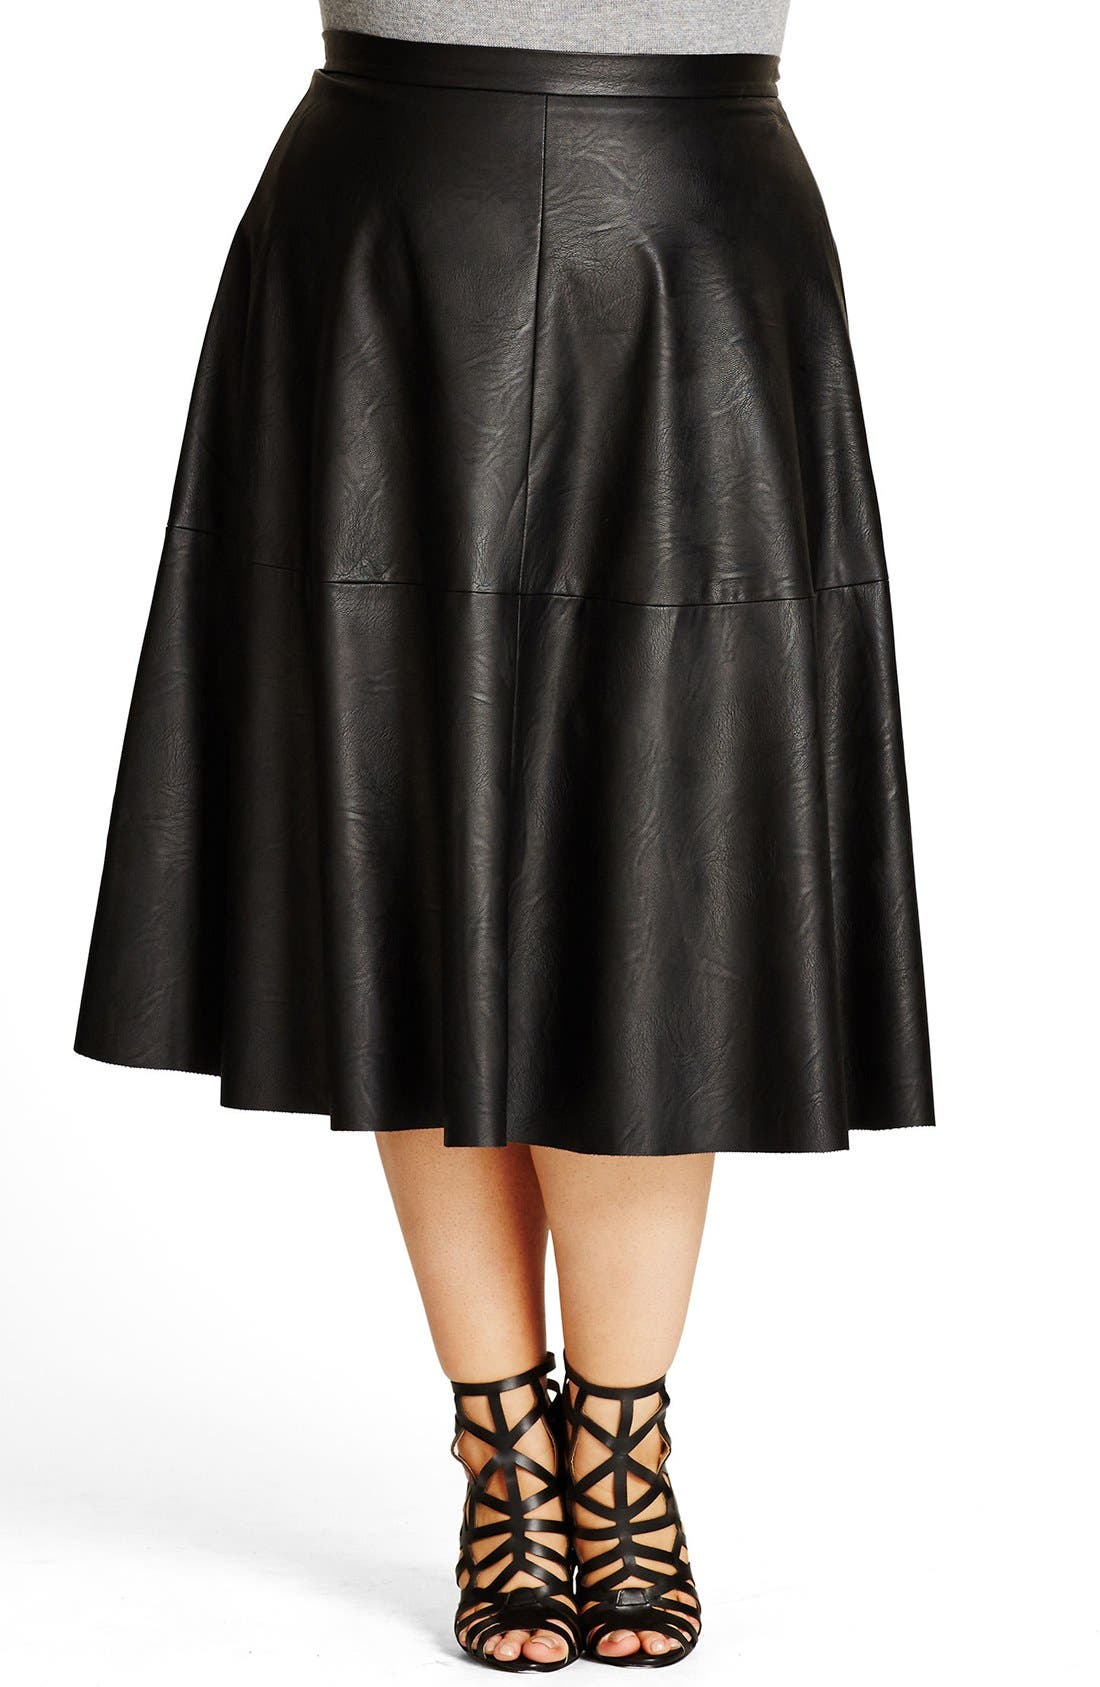 Main Image - City Chic 'Flirt' Faux Leather Midi Skirt (Plus Size)